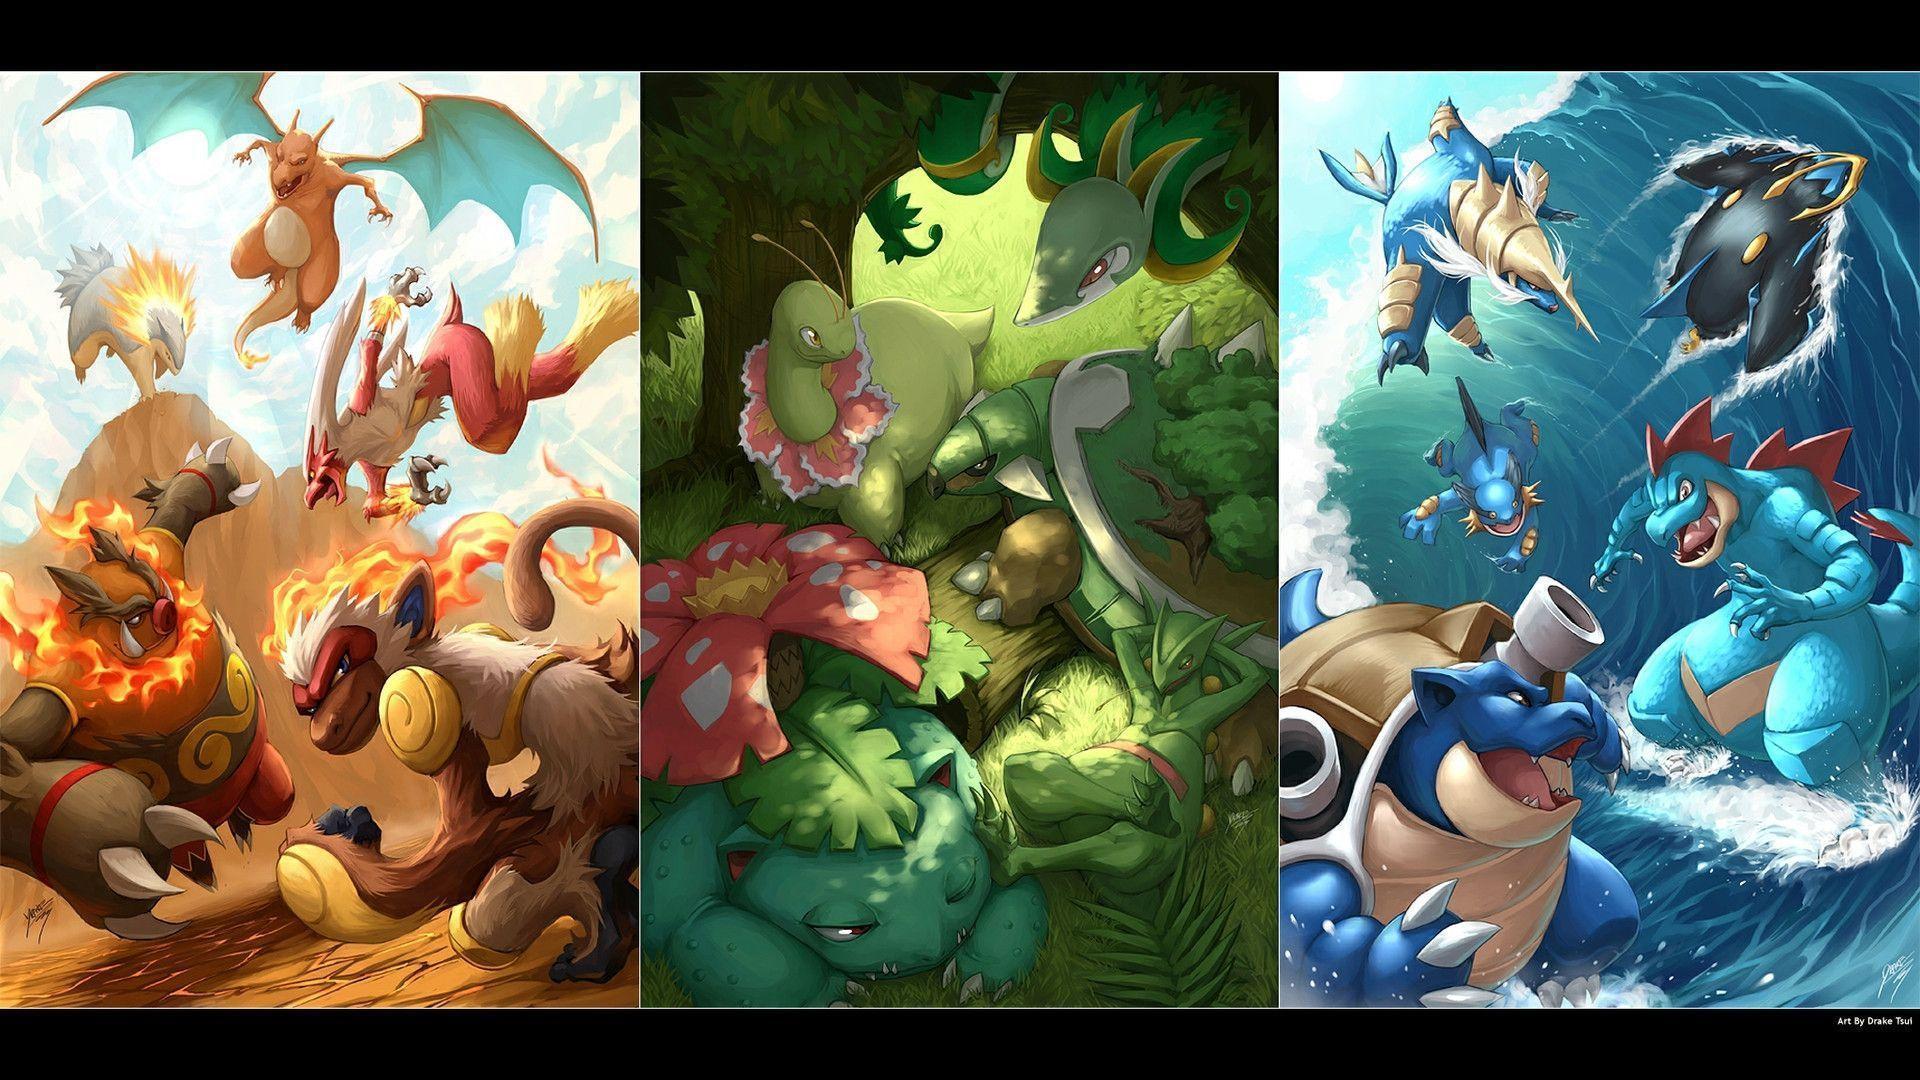 Fire Pokemon Wallpapers - Wallpaper Cave